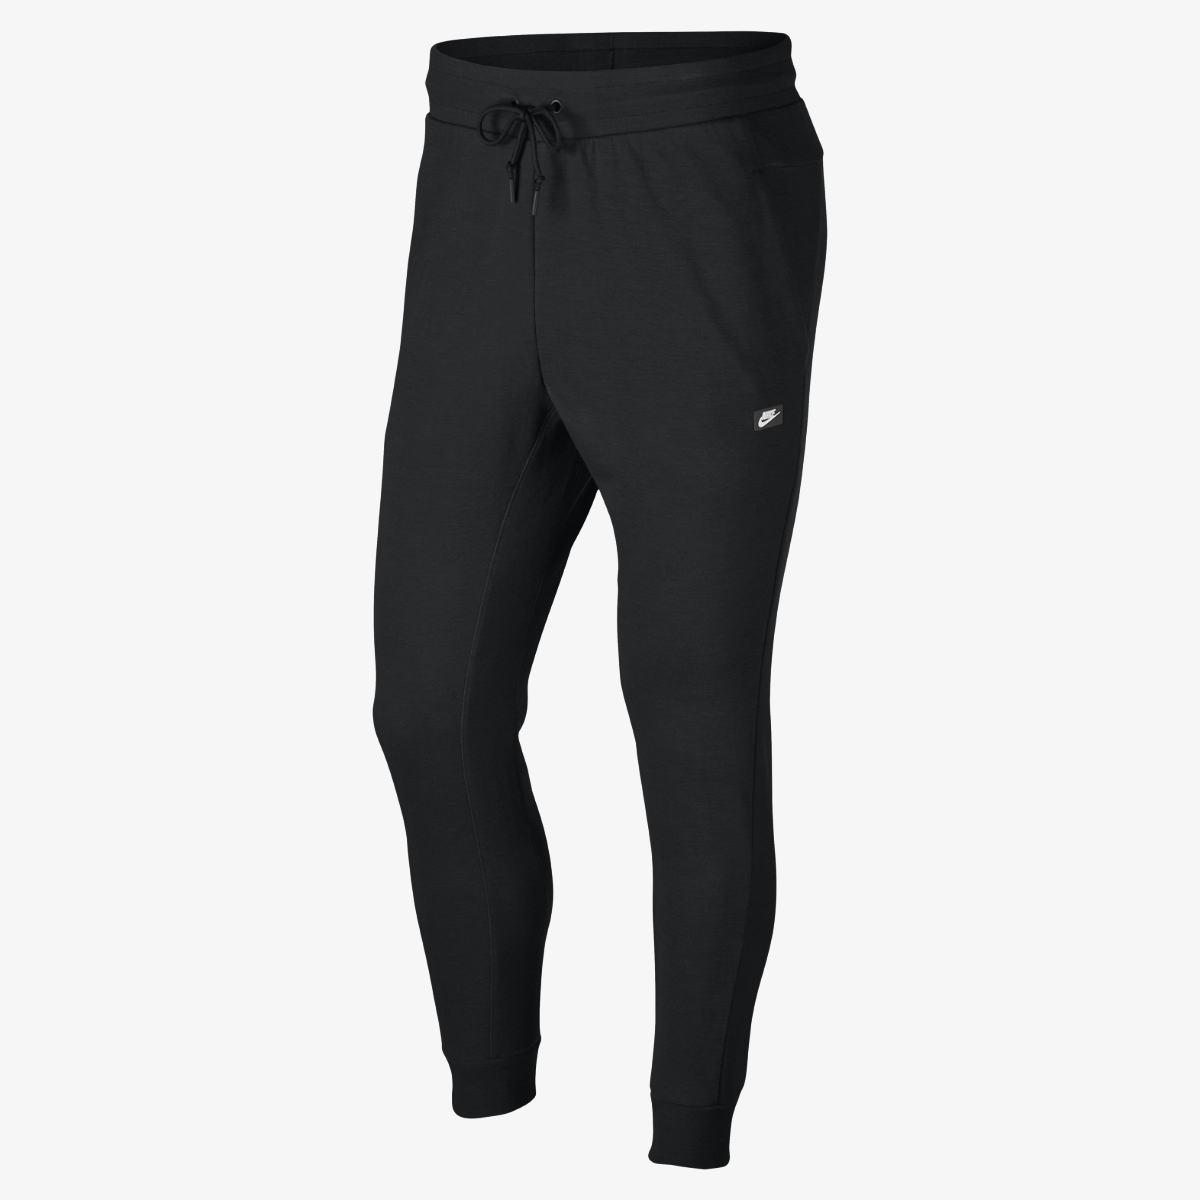 d13c8498 Штаны Nike Nsw Optilc Jggr 928493-011 (Оригинал) - Football Mall -  футбольный